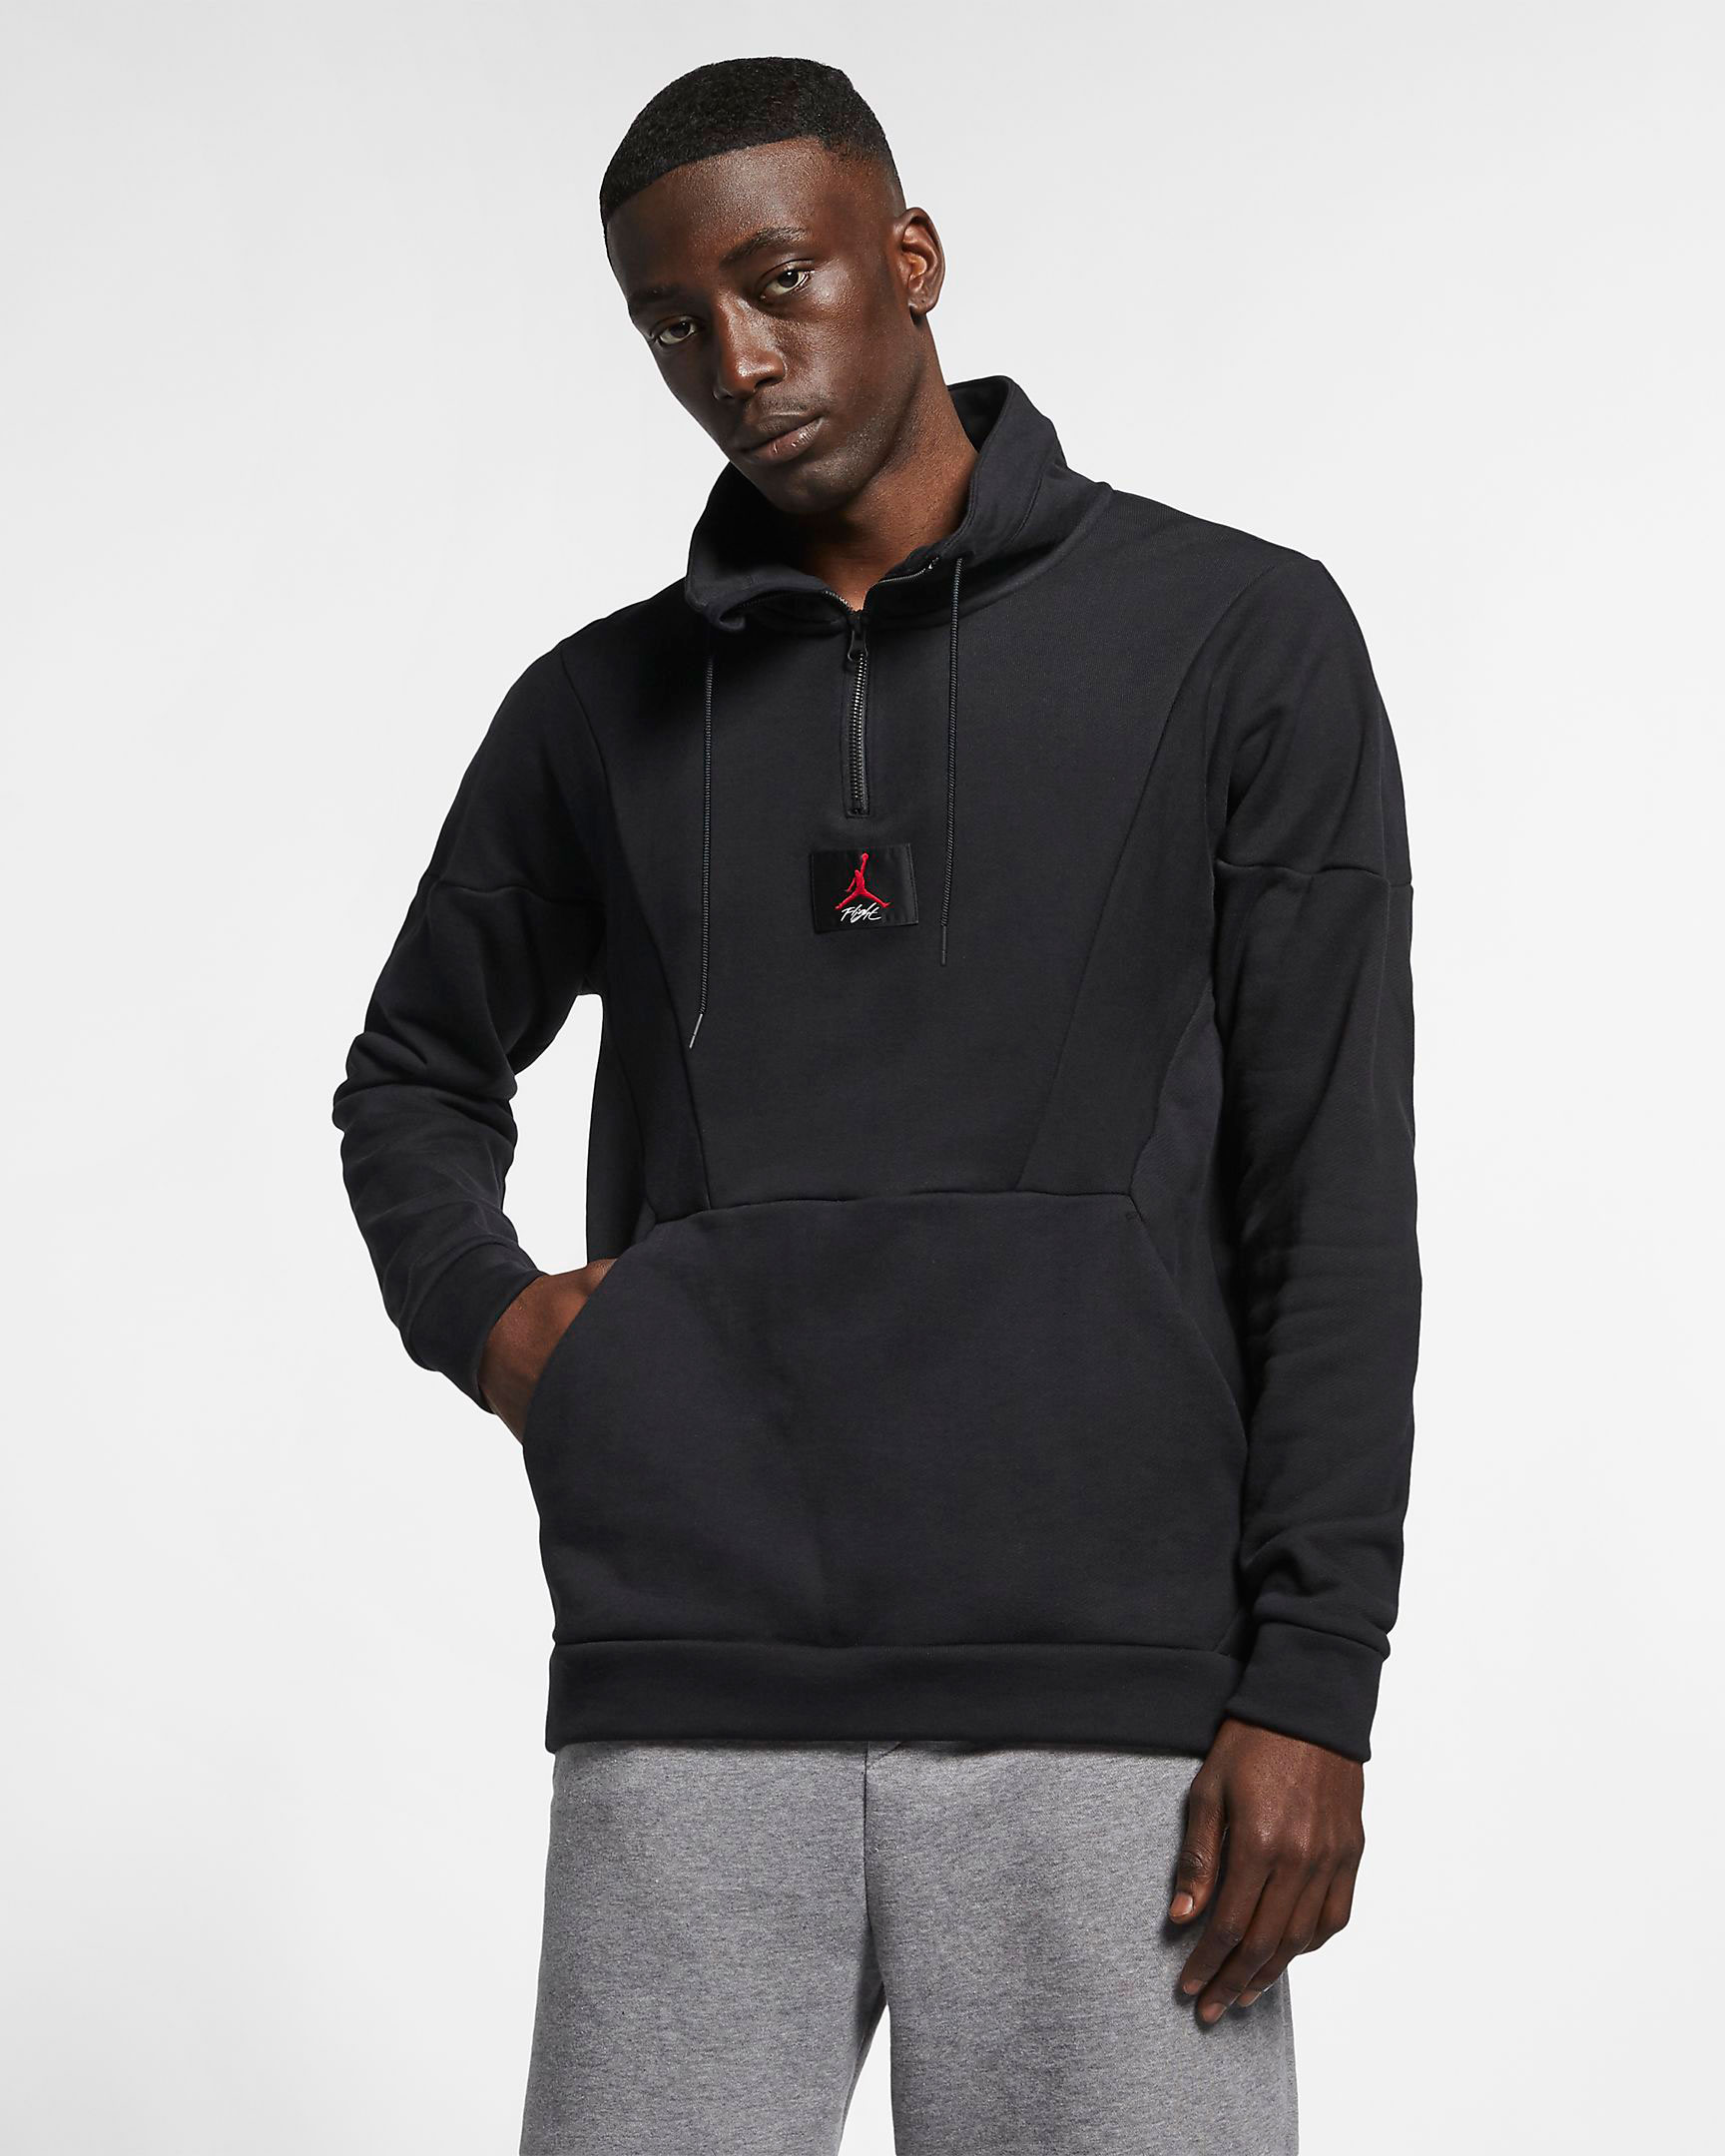 air-jordan-4-bred-sweatshirt-match-5